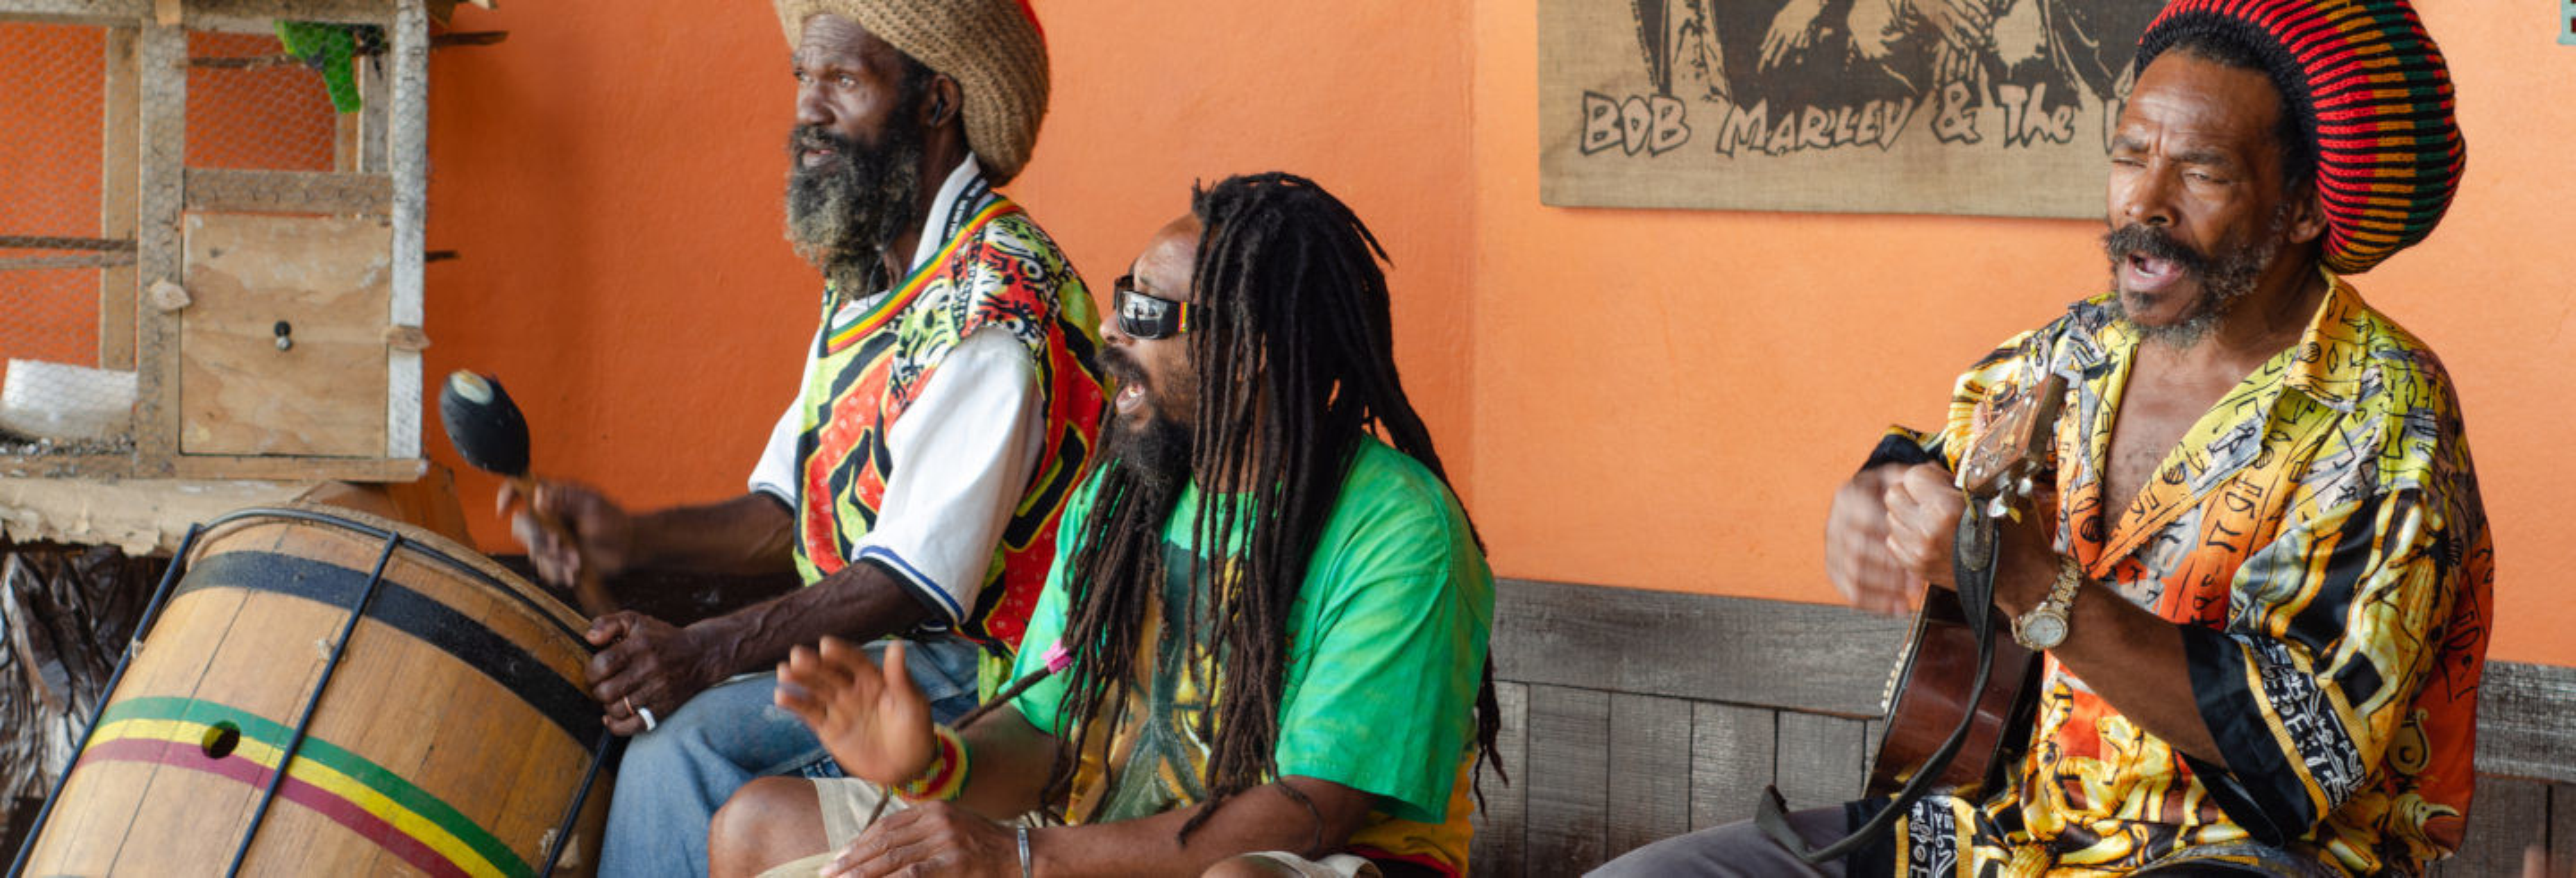 Tour di Bob Marley